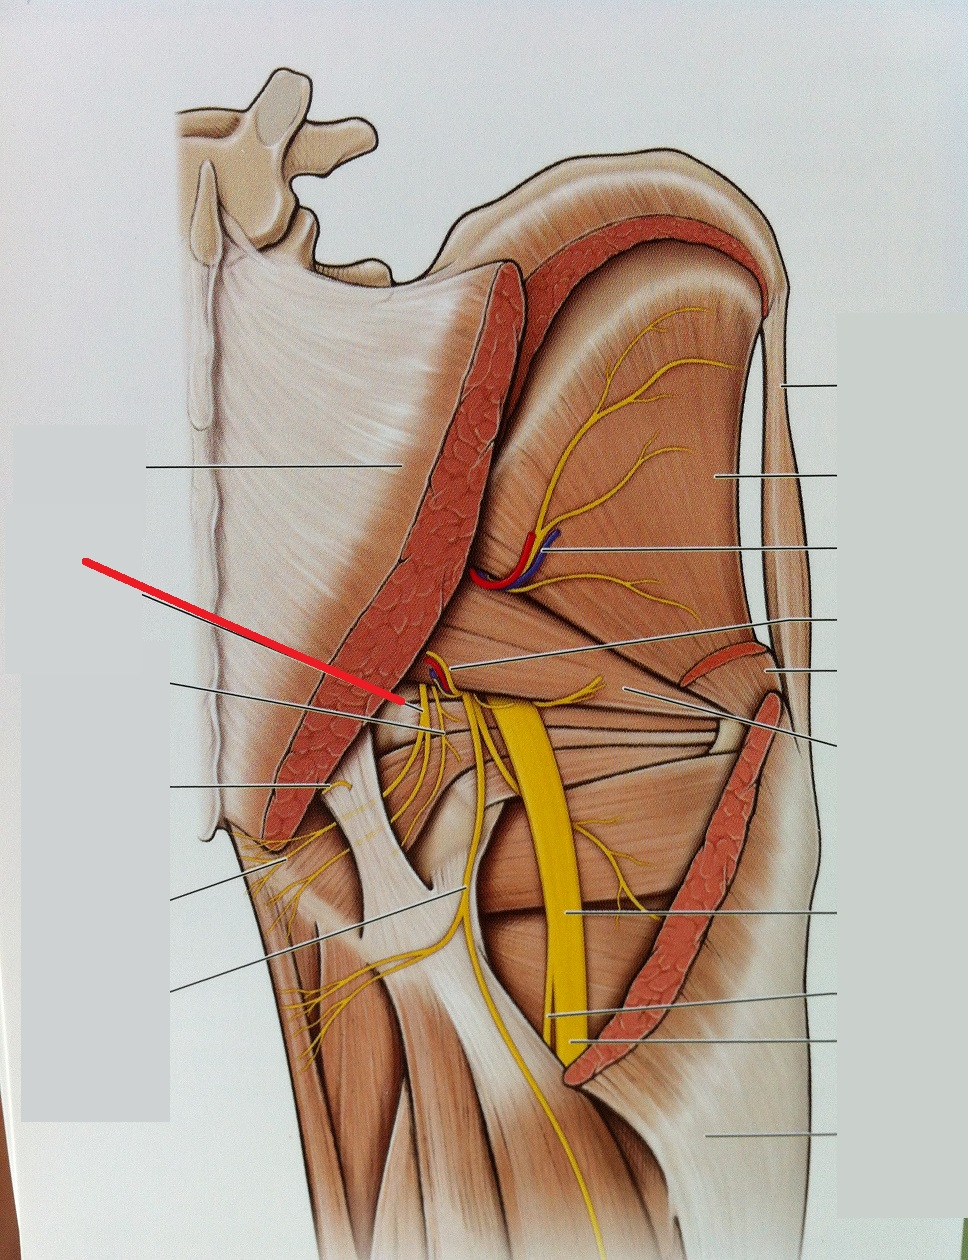 Level 102 Anatomy Of The Extremities Memrise